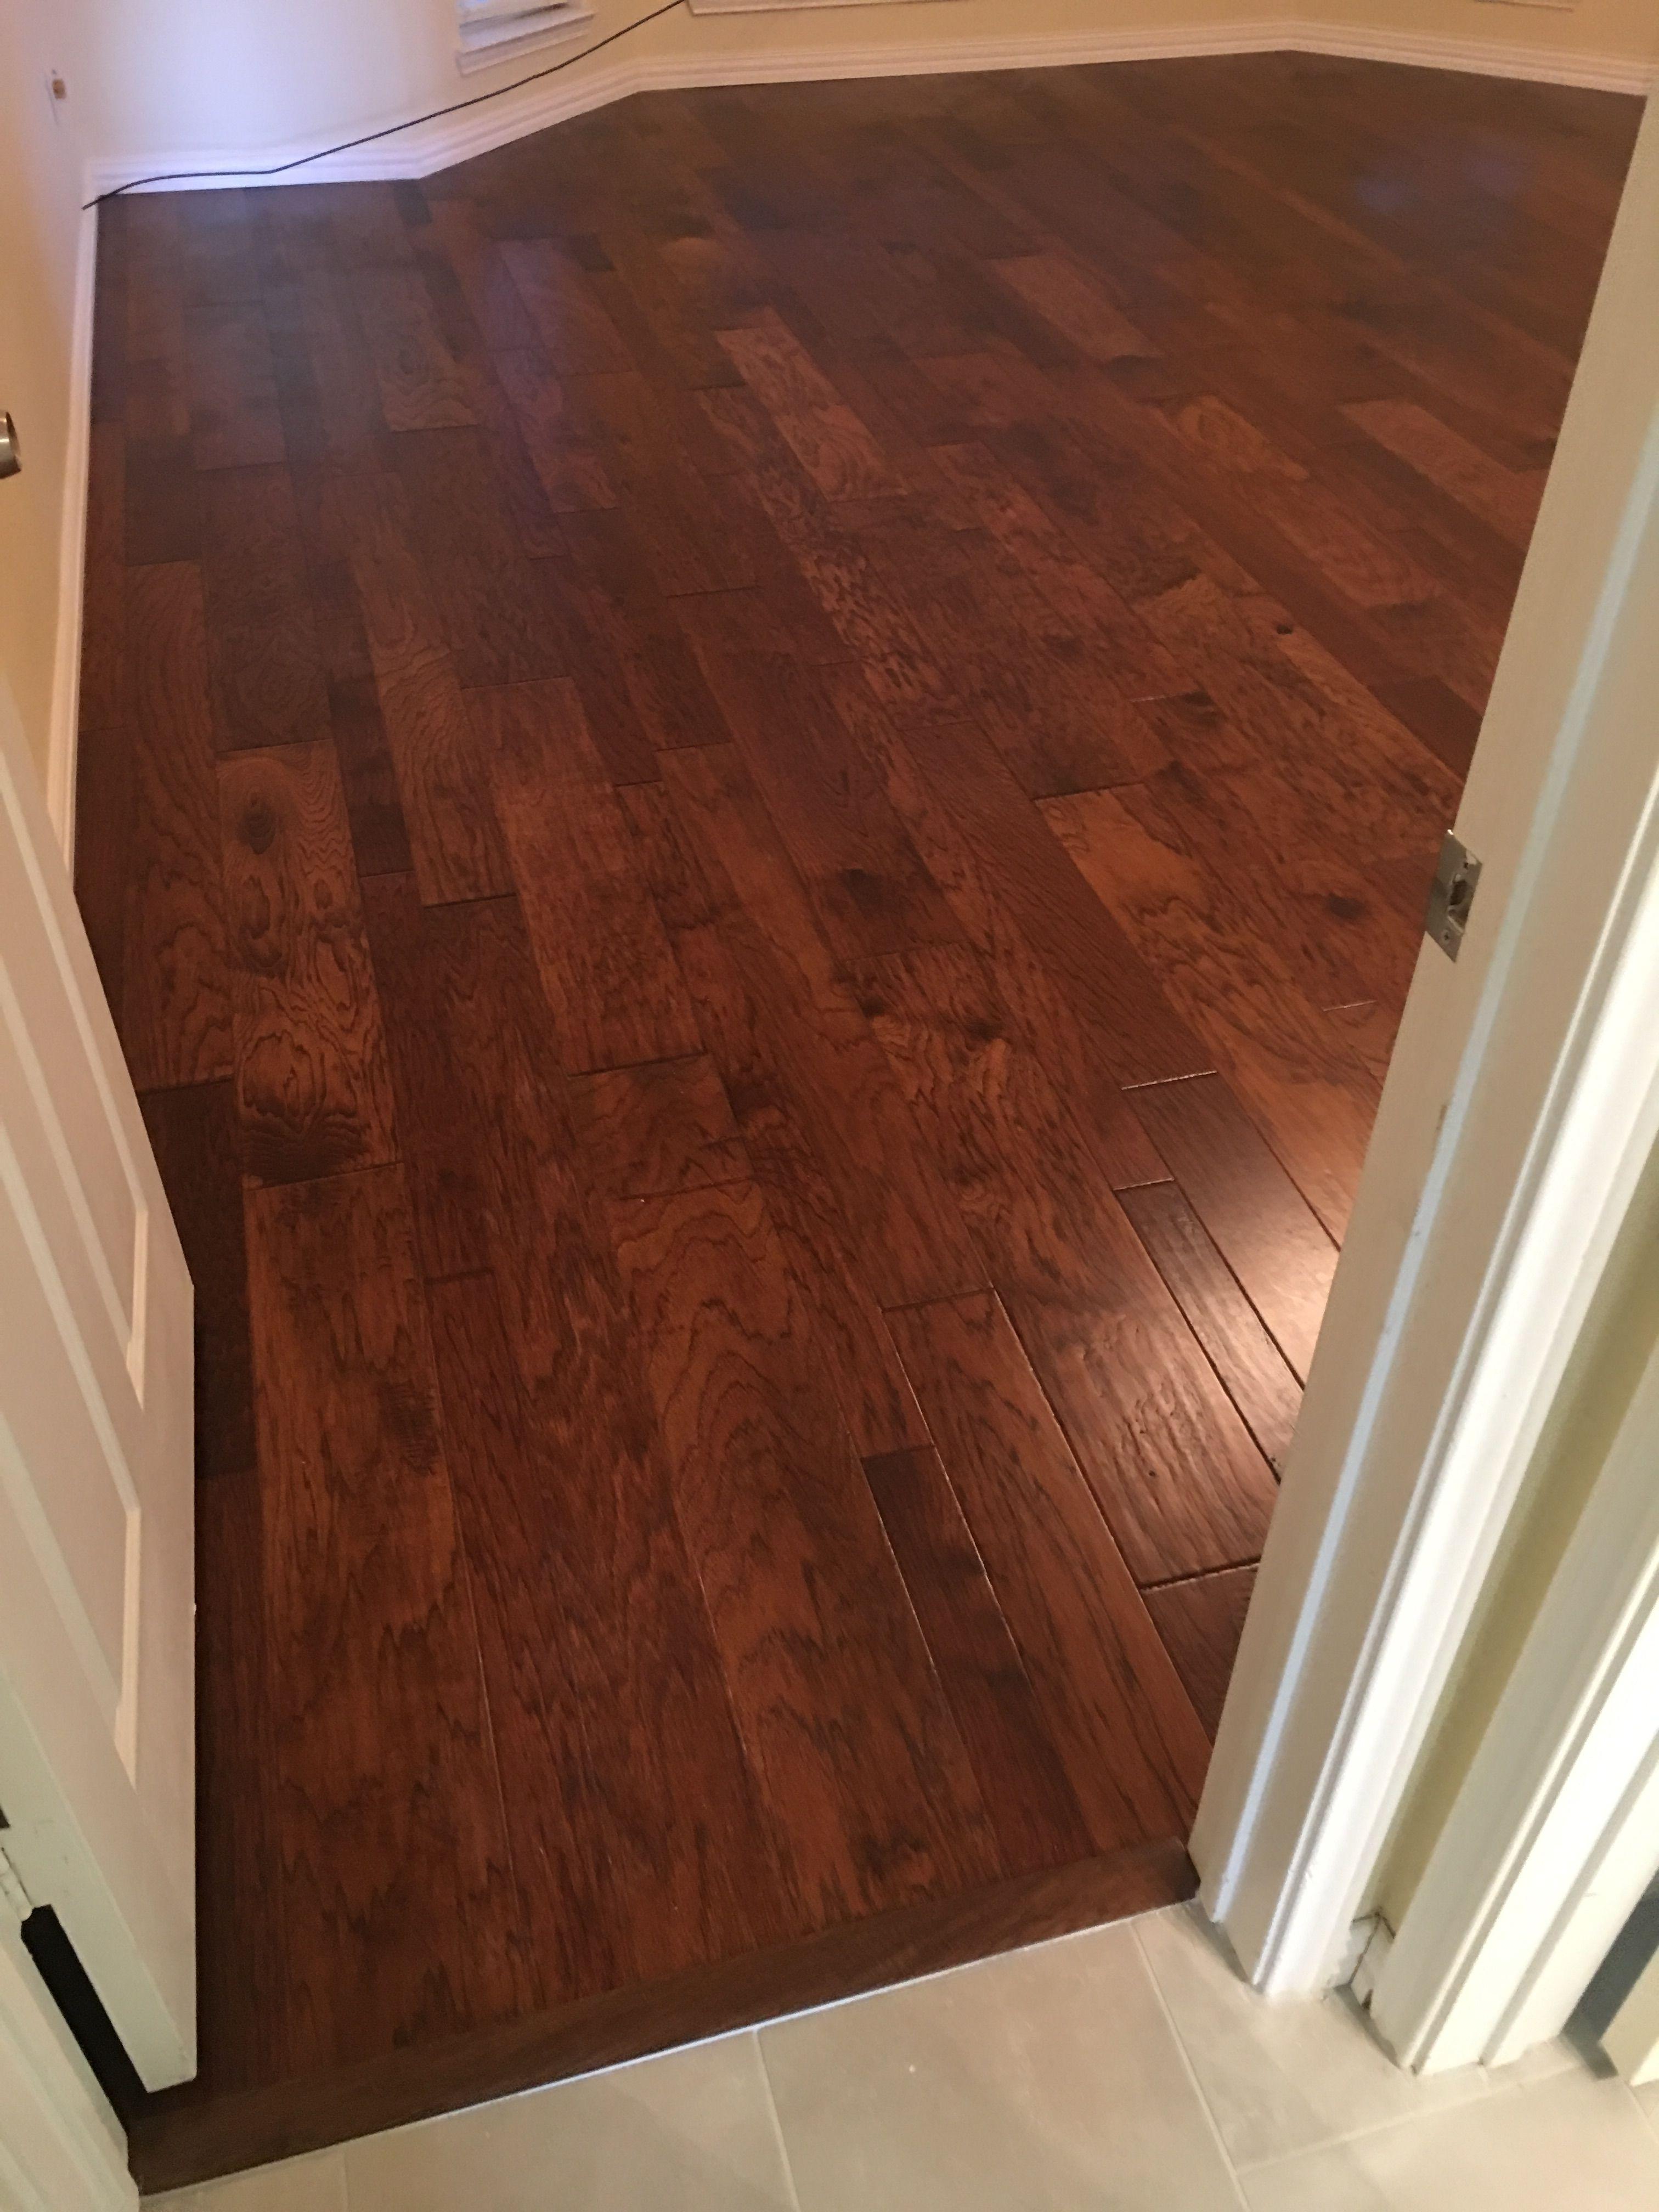 Regal Walla Walla Hickory Color Redwood Mountain Laminate Flooring Hardwood Floors Vinyl Plank Flooring